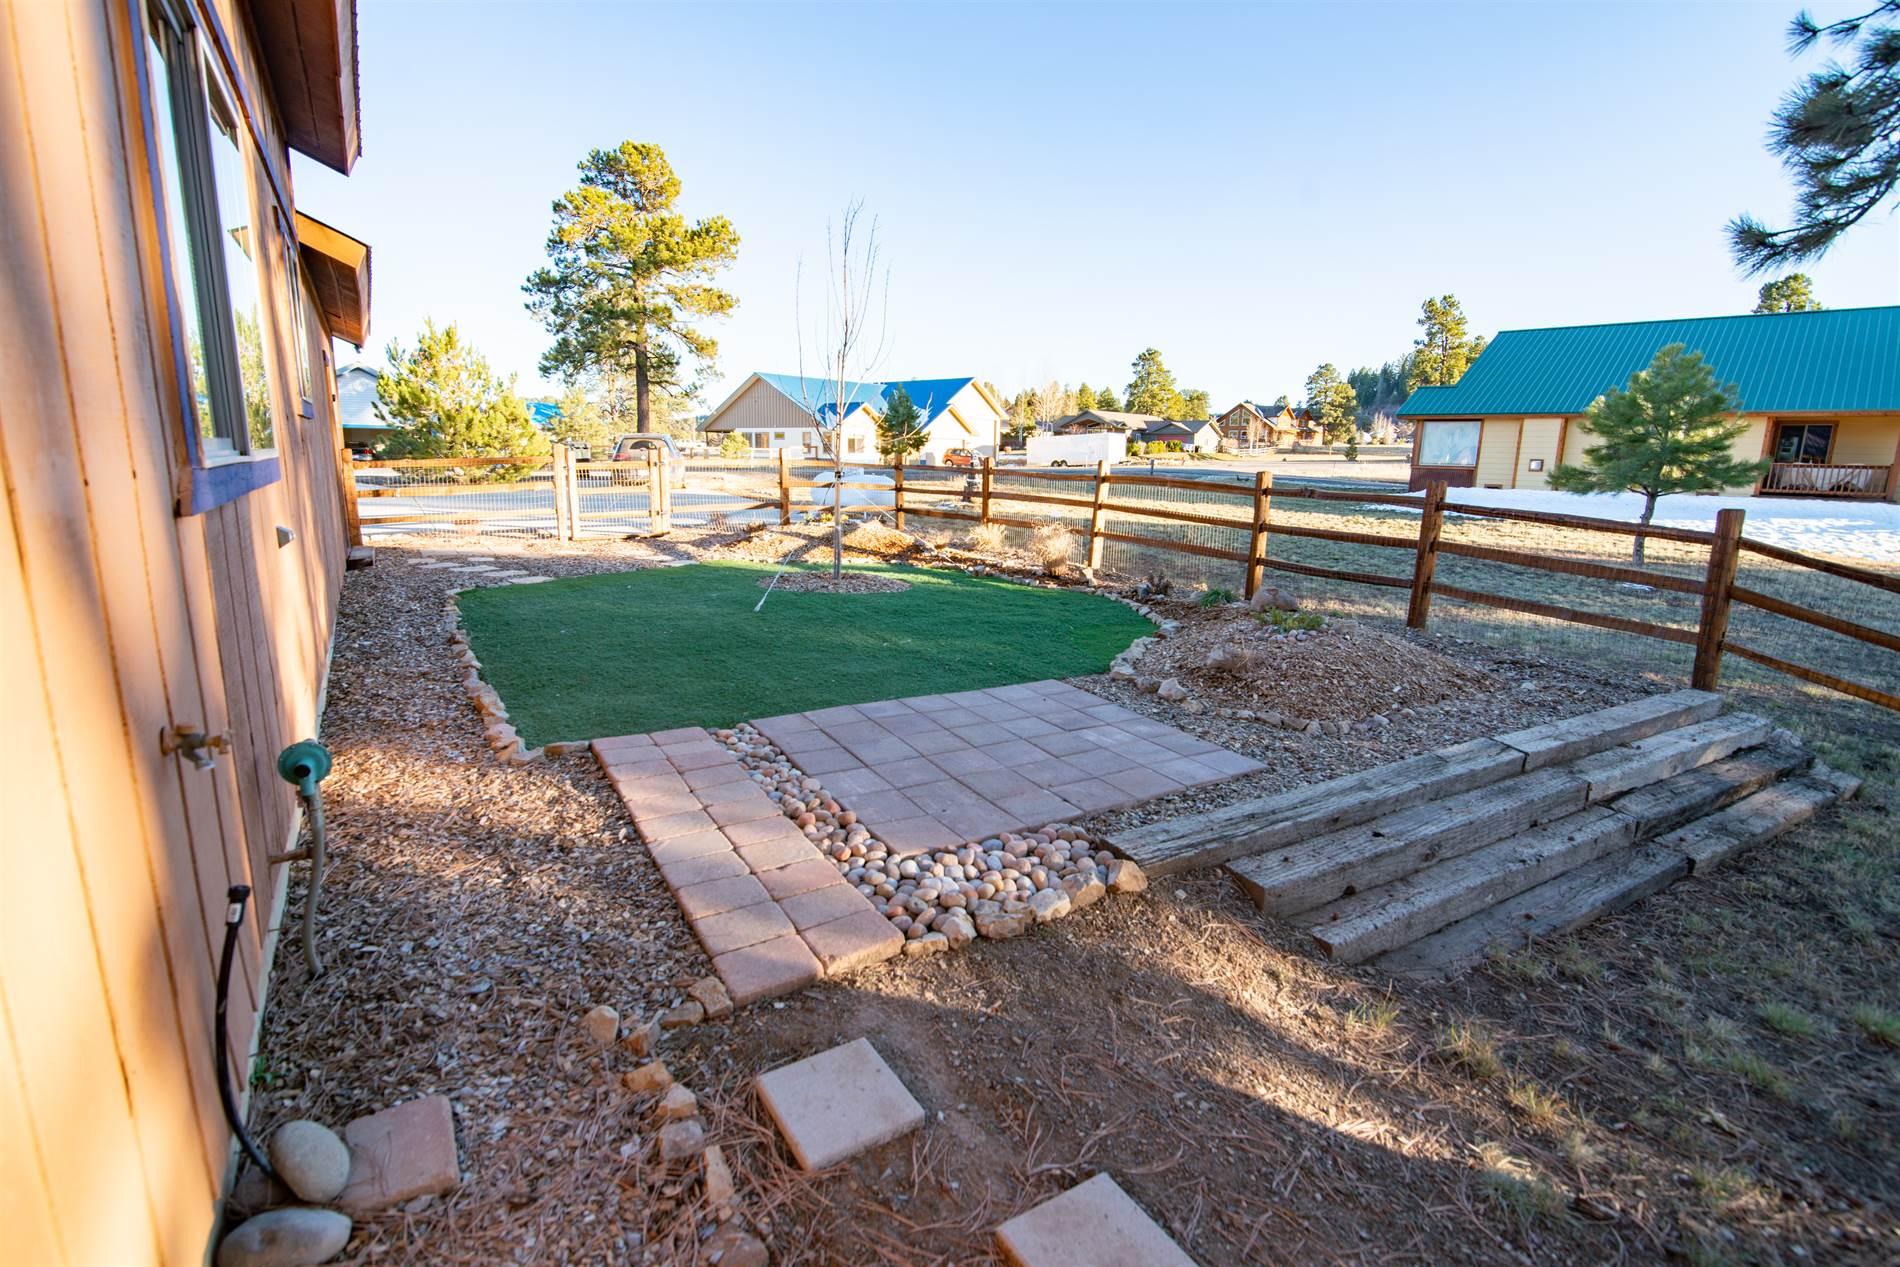 Mountain View Villa, #455 Saturn - Short Term, Pagosa Springs, CO 81147